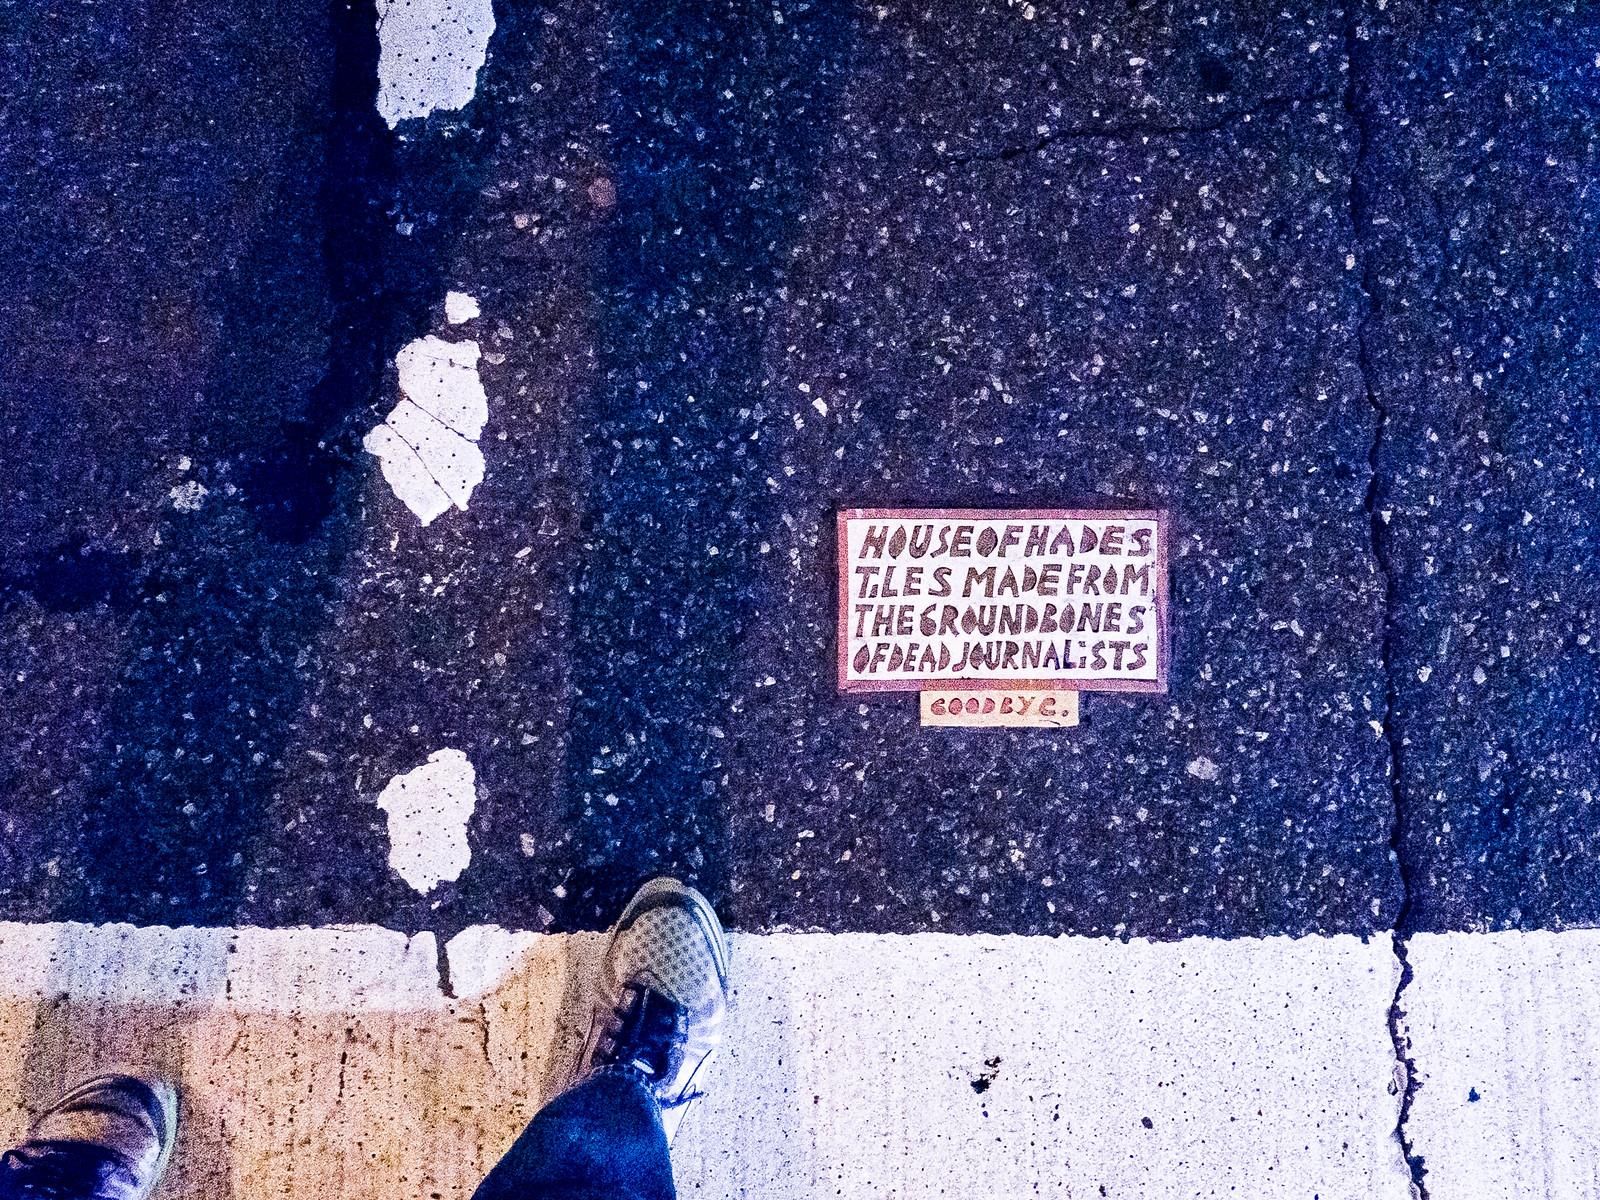 The ground bones of dead journalists... by wwward0